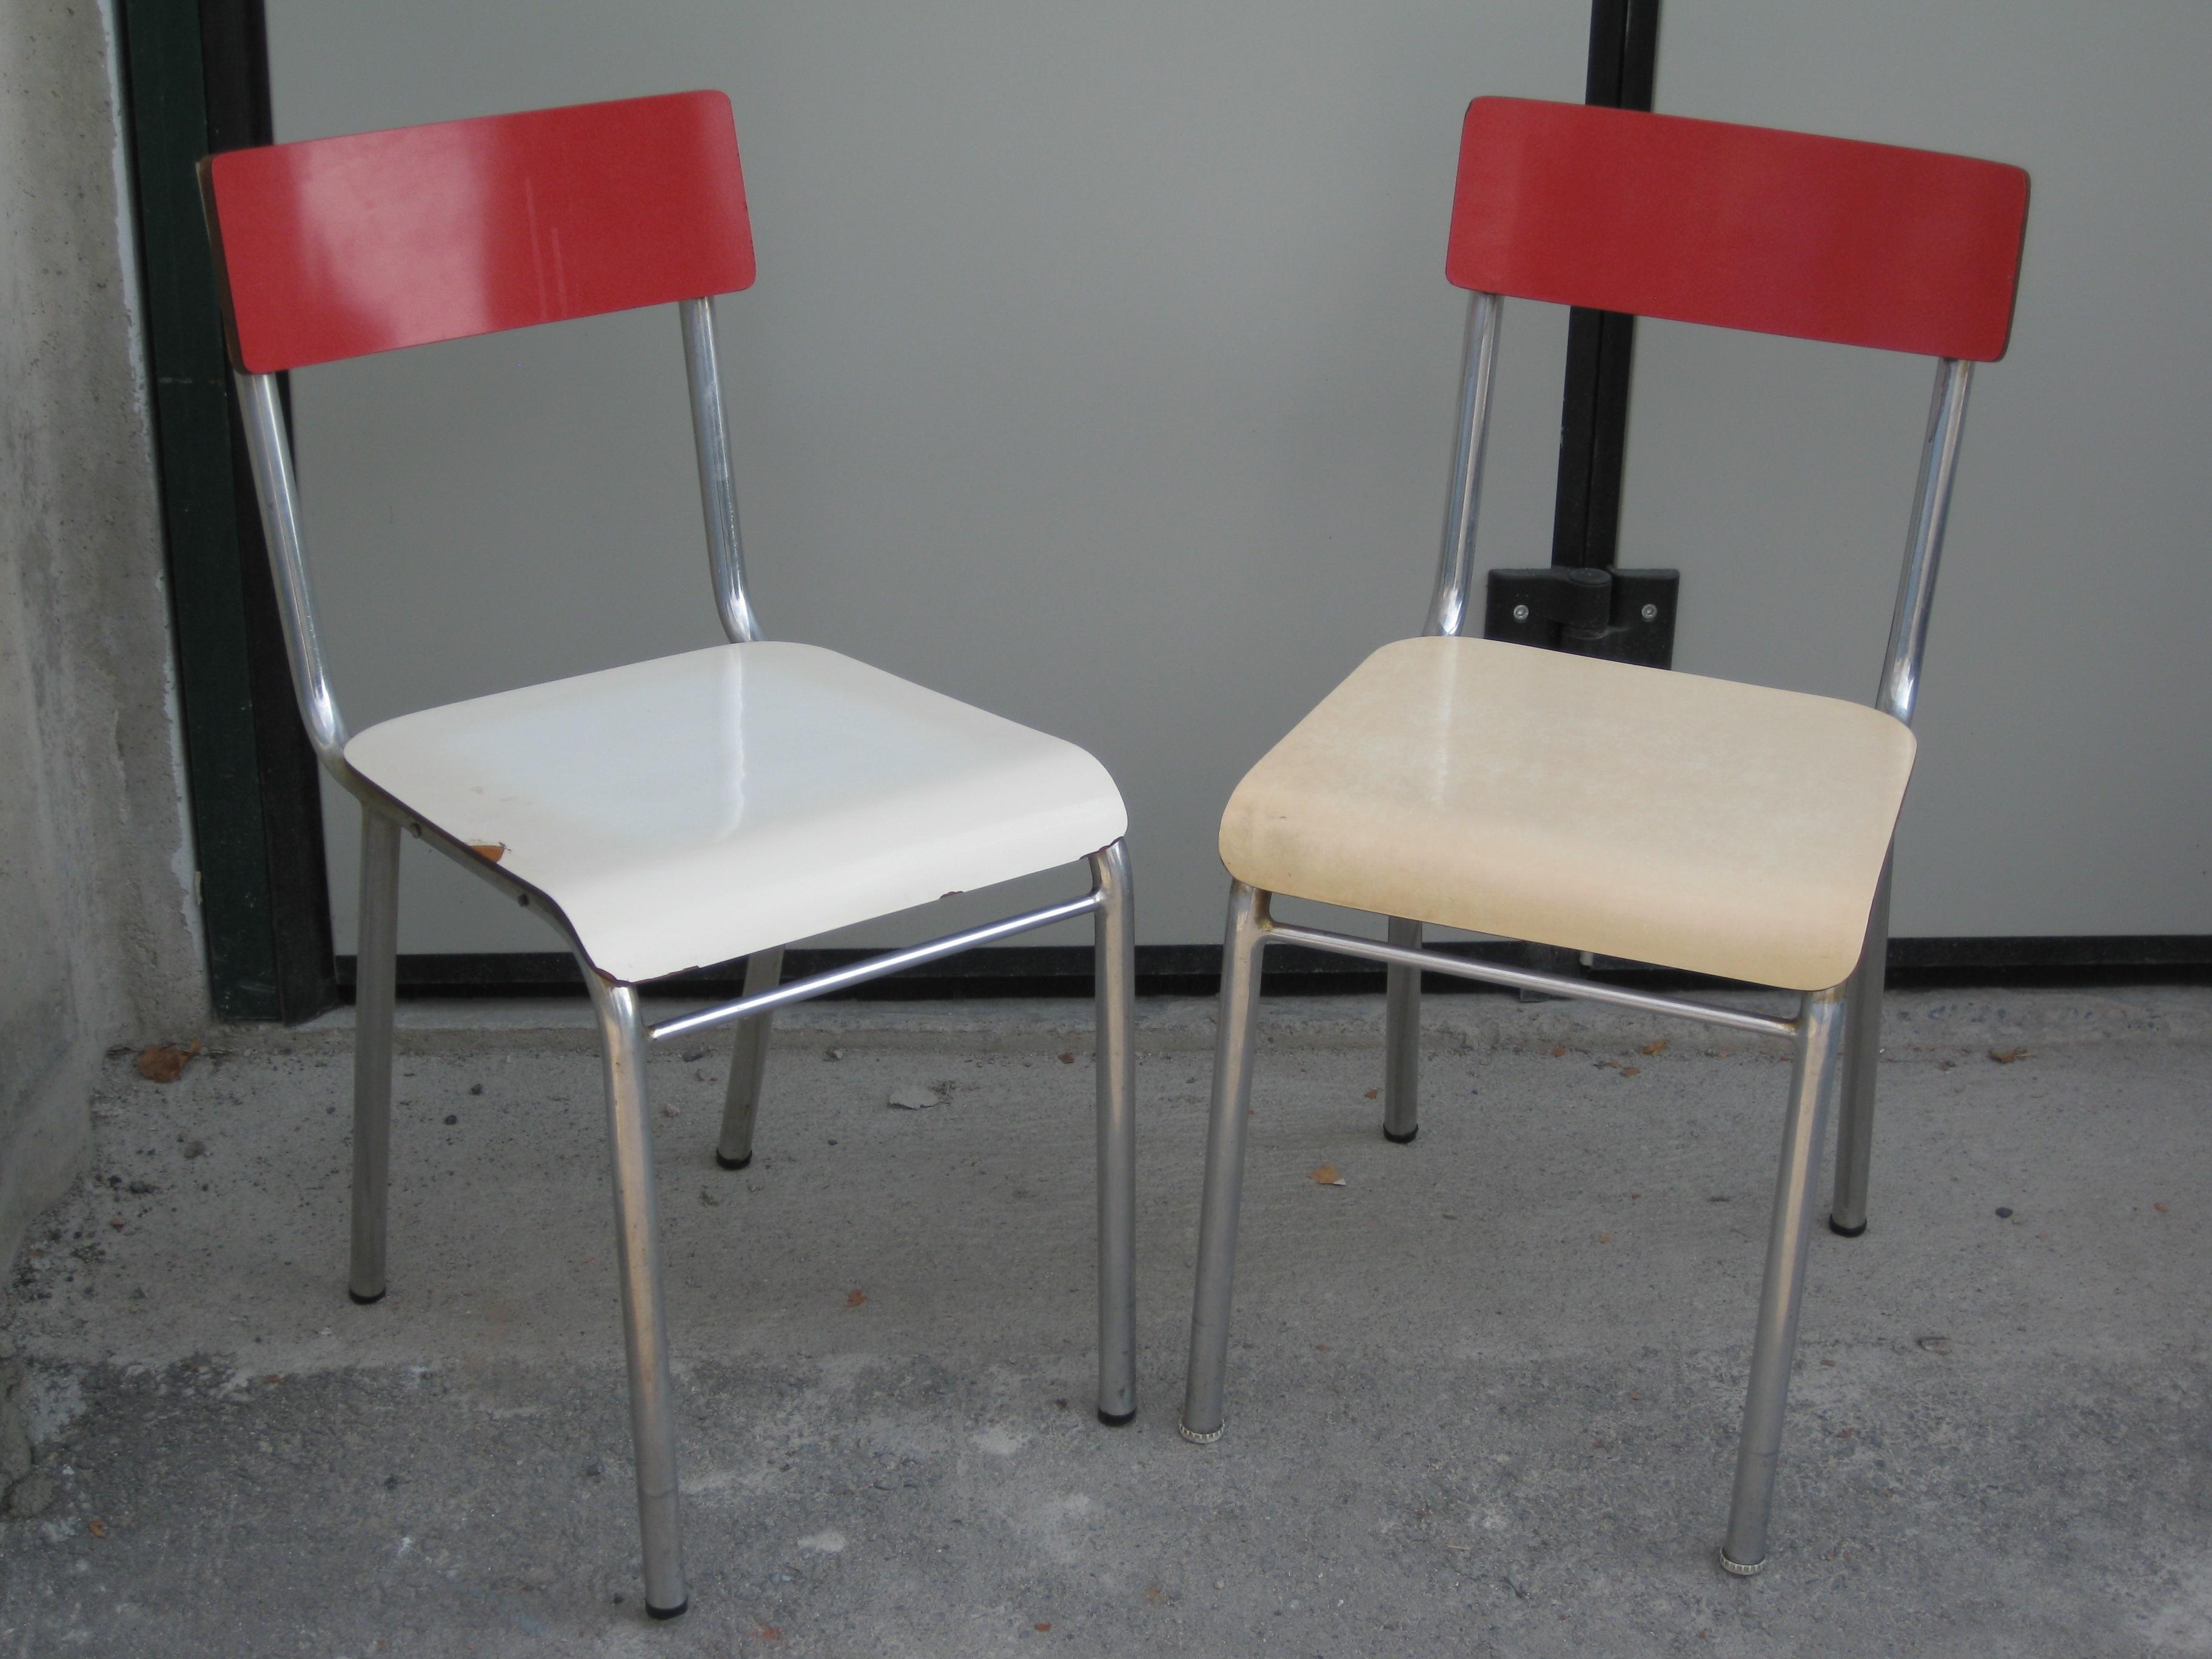 Sedie Rosse Cucina : Abbinare tavolo e sedie foto design mag